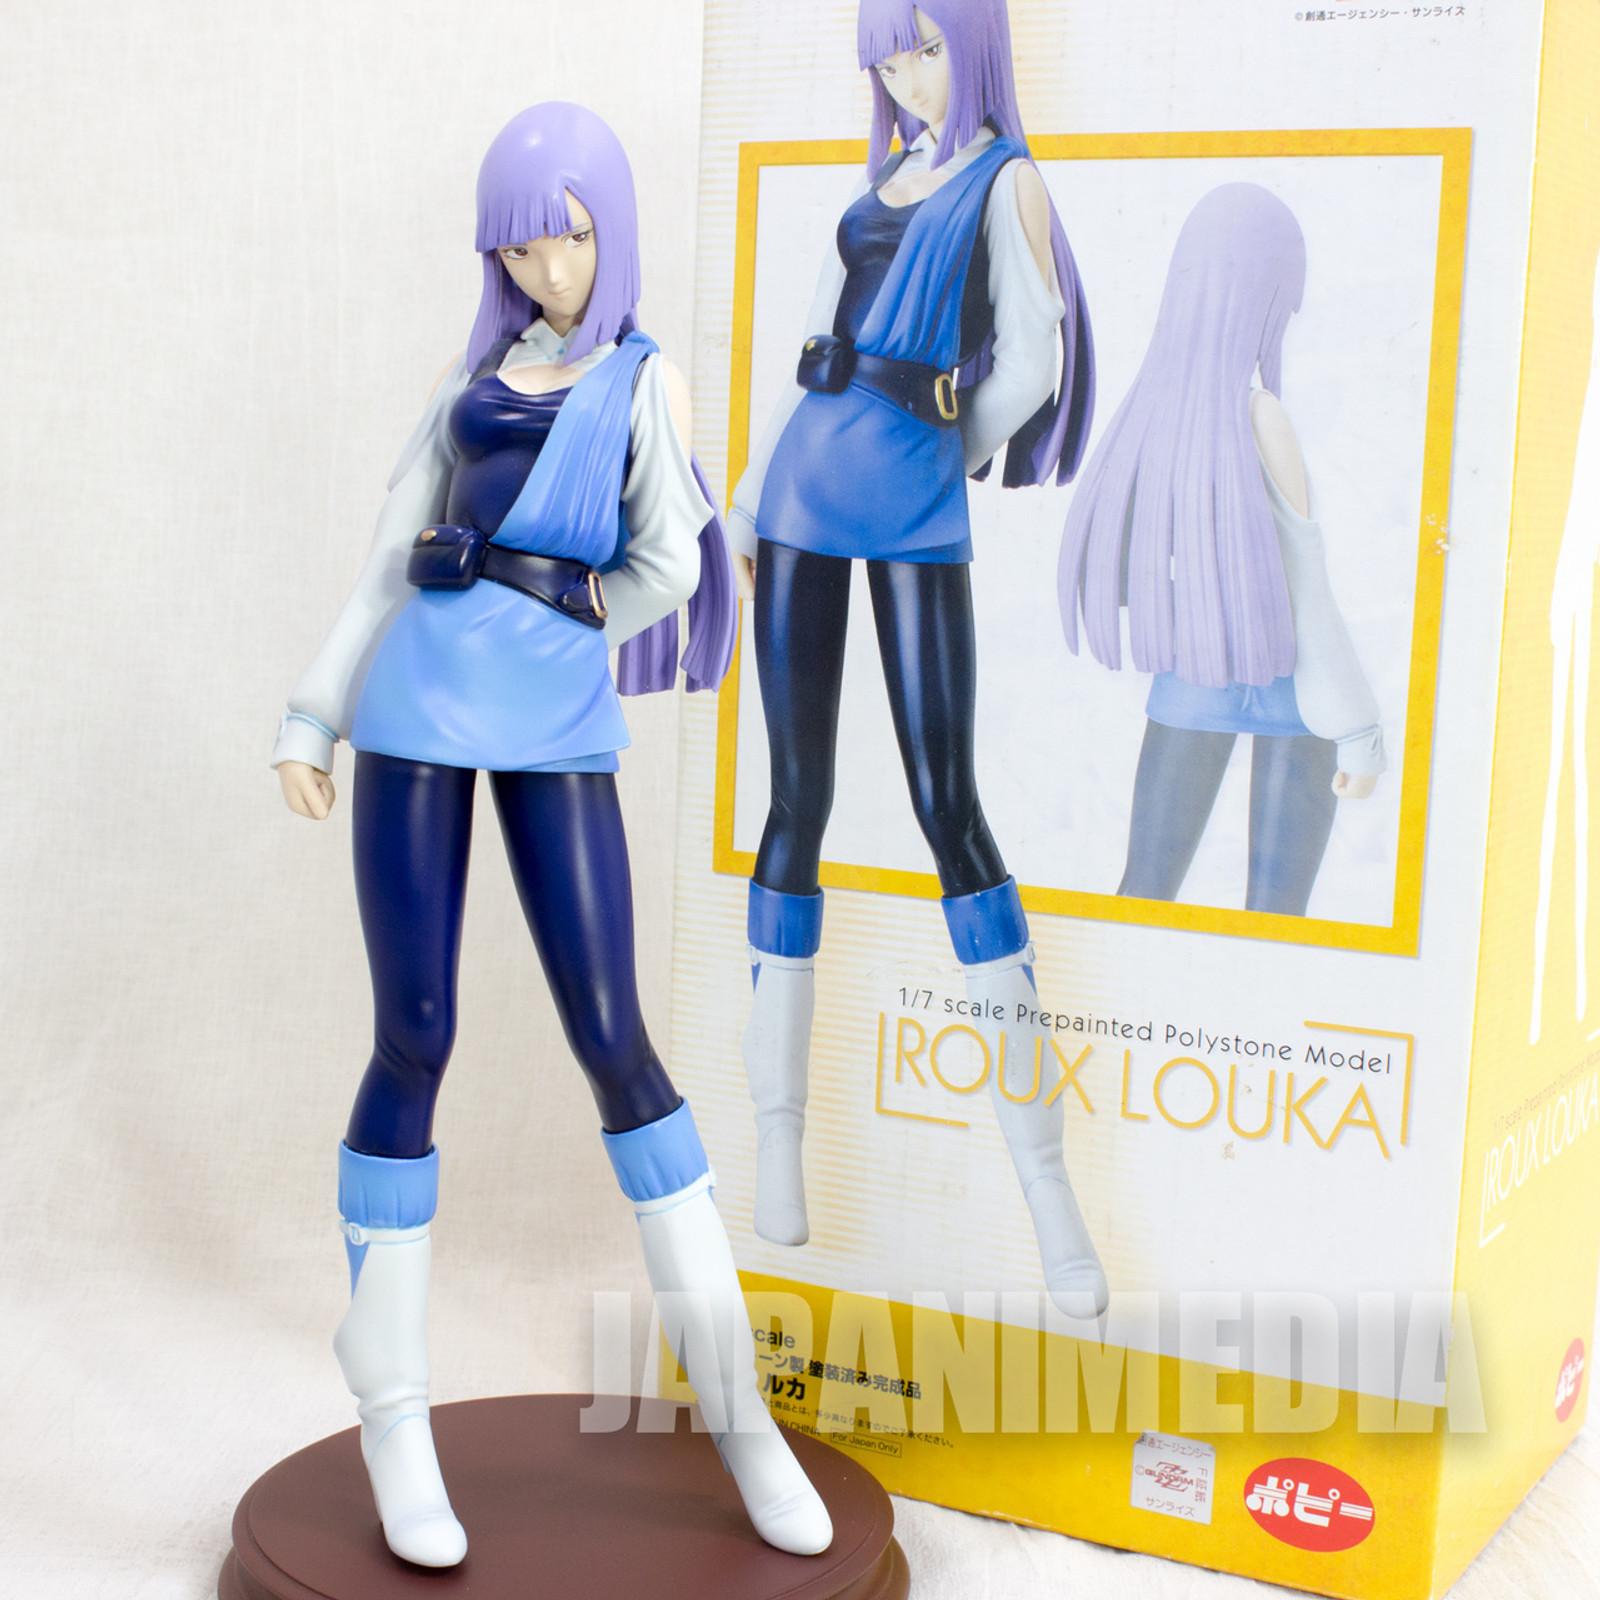 RARE! Gundam ZZ Roux Louka Figure Polystone 1/7 Scale Popy